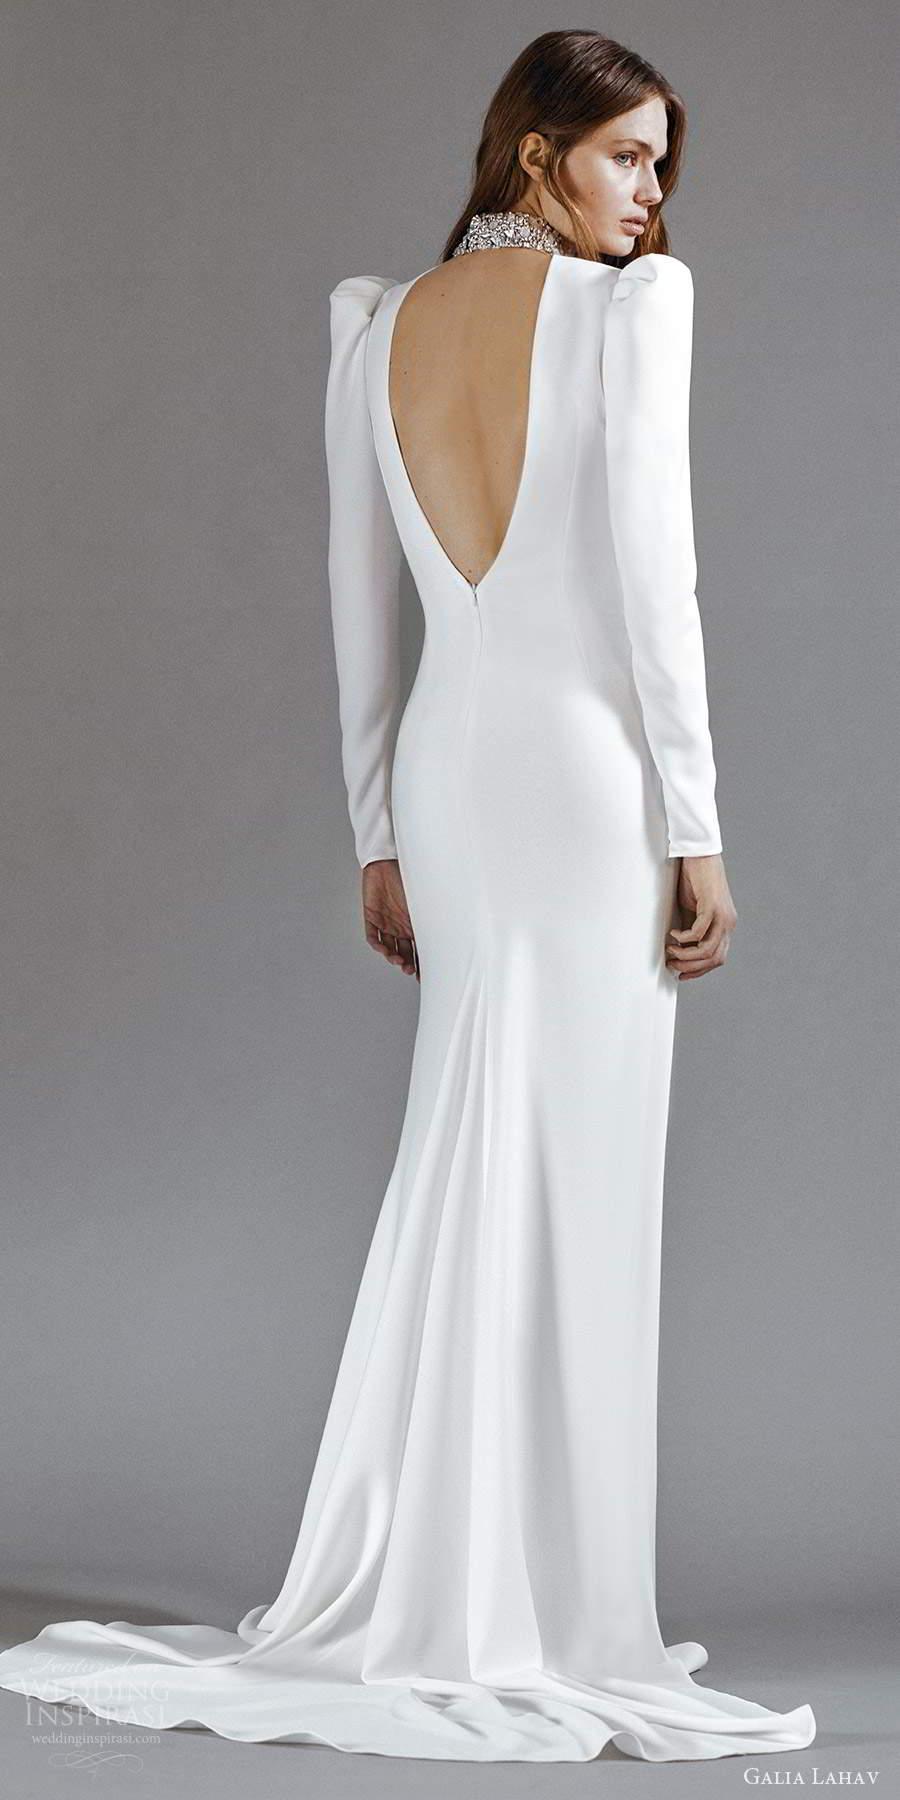 galia lahav 2021 rtw bridal long puff sleeves embellished high neckline clean minimalist sheath column a line wedding dress chapel train keyhole back (6) bv